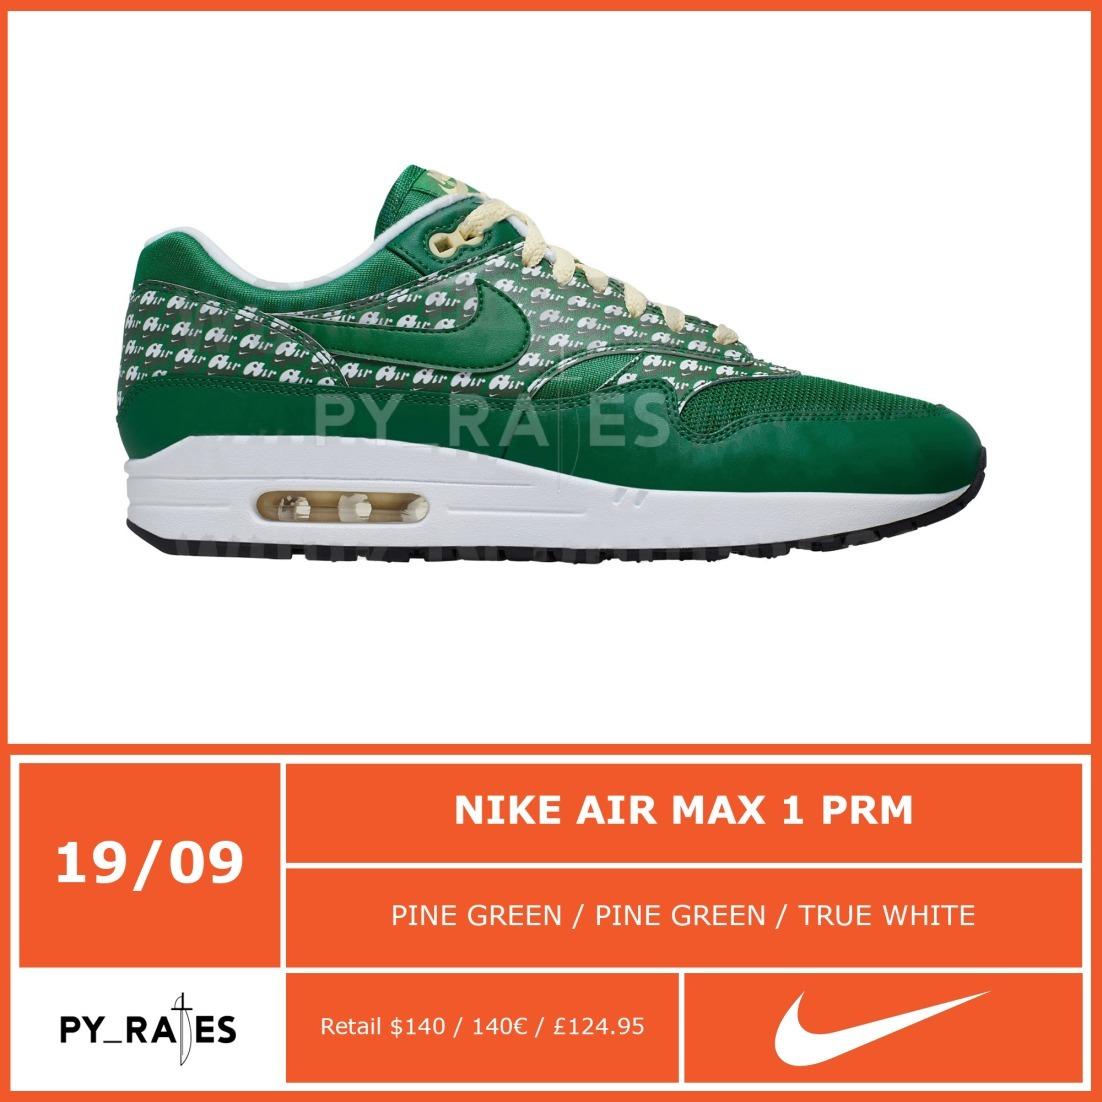 Nike Air Max 1 PRM Powerwall Green Lemonade Release Info